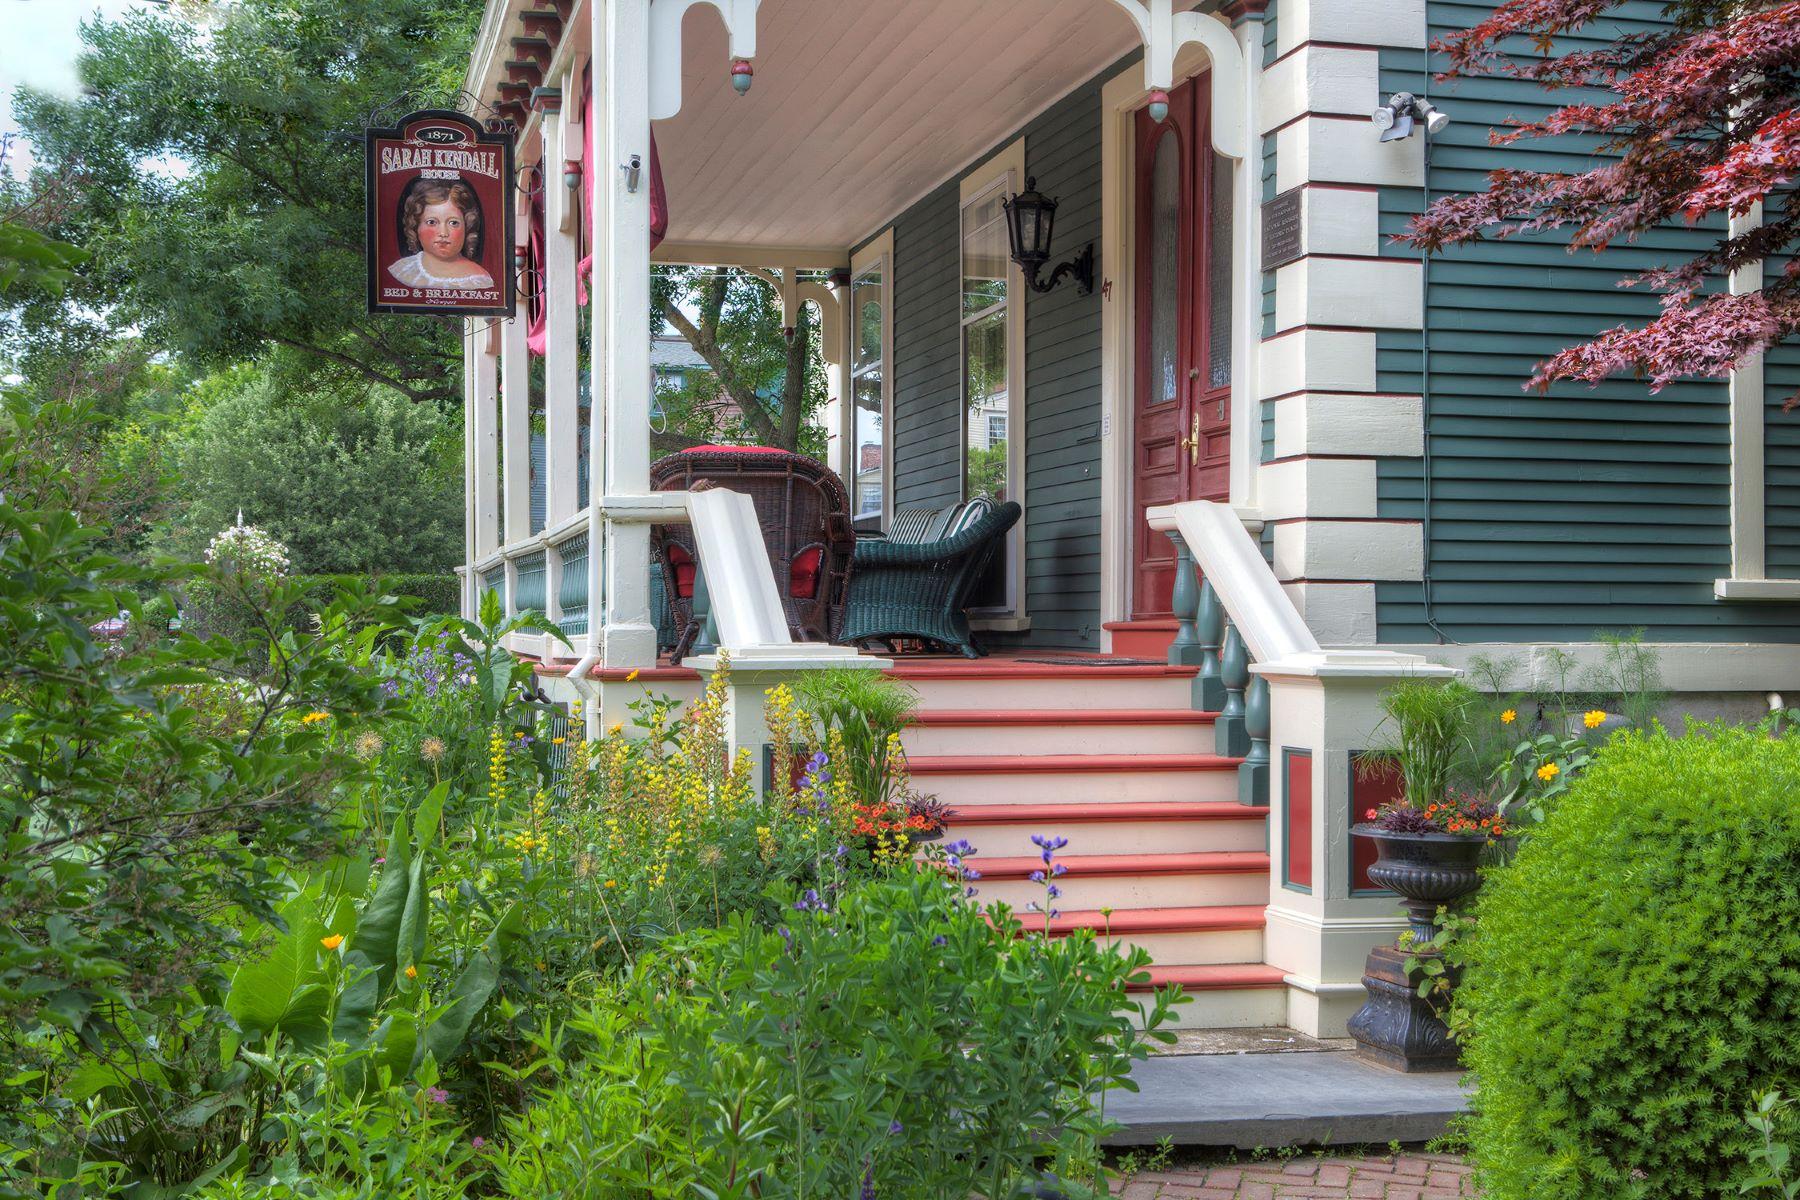 Additional photo for property listing at The Sarah Kendall House 47 Washington Street 纽波特, 罗得岛 02840 美国